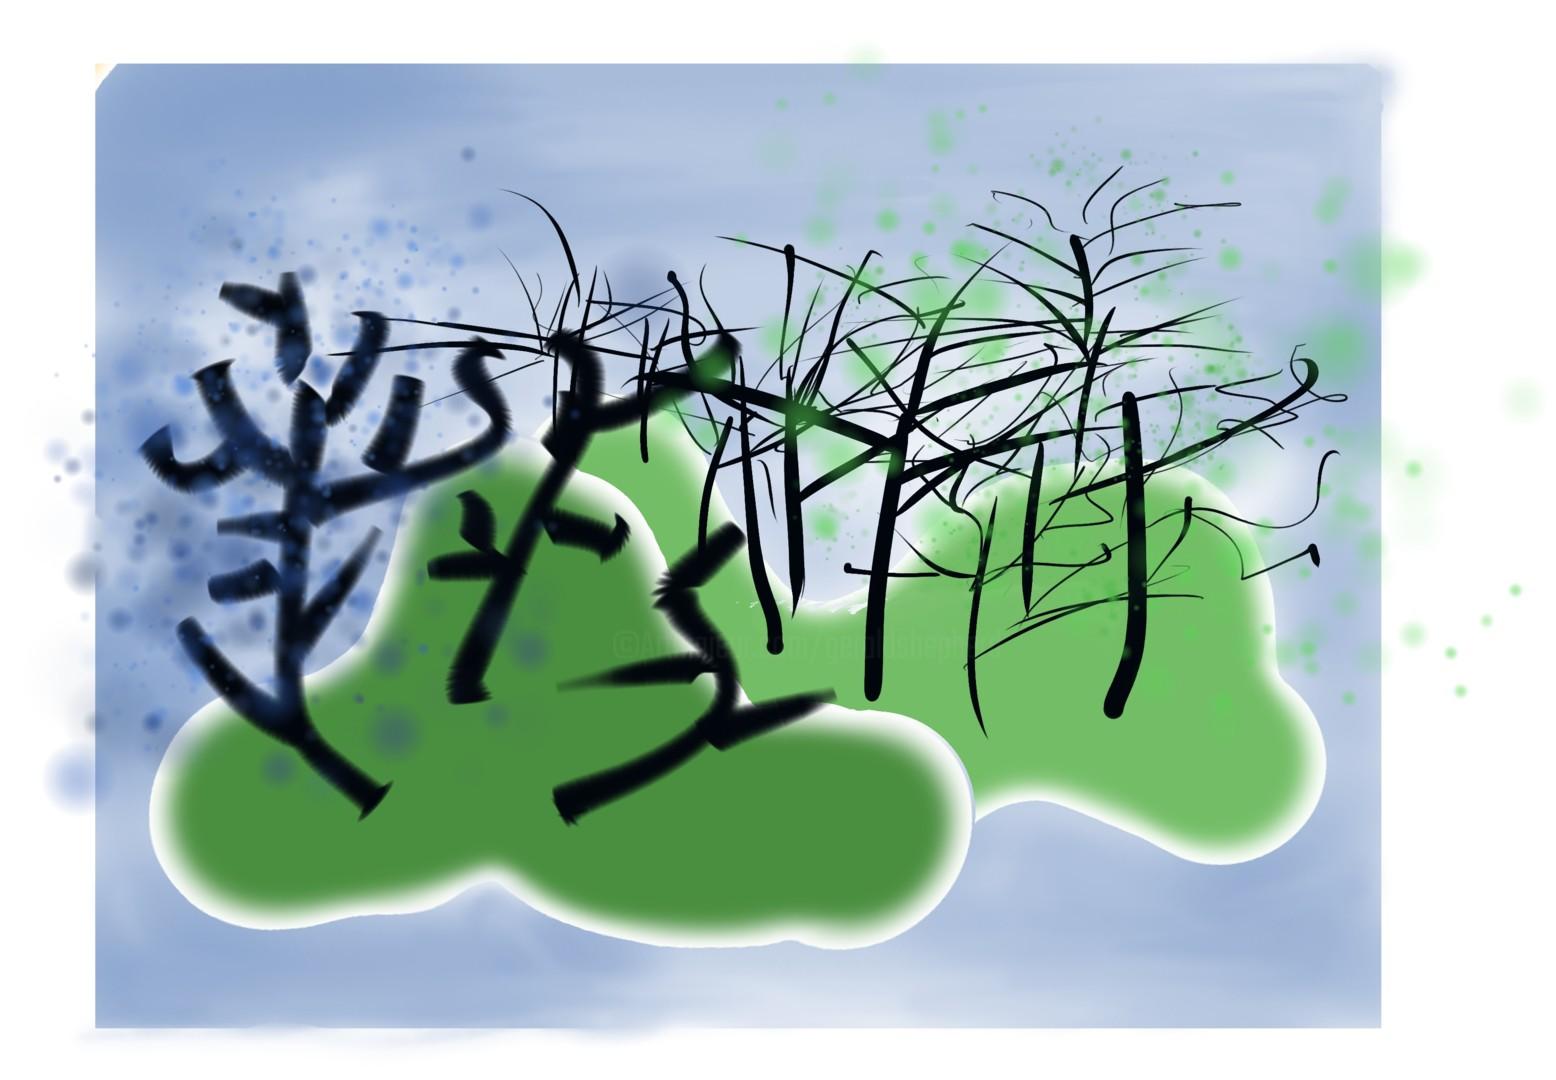 Gerald Shepherd - Landscape Improvisation